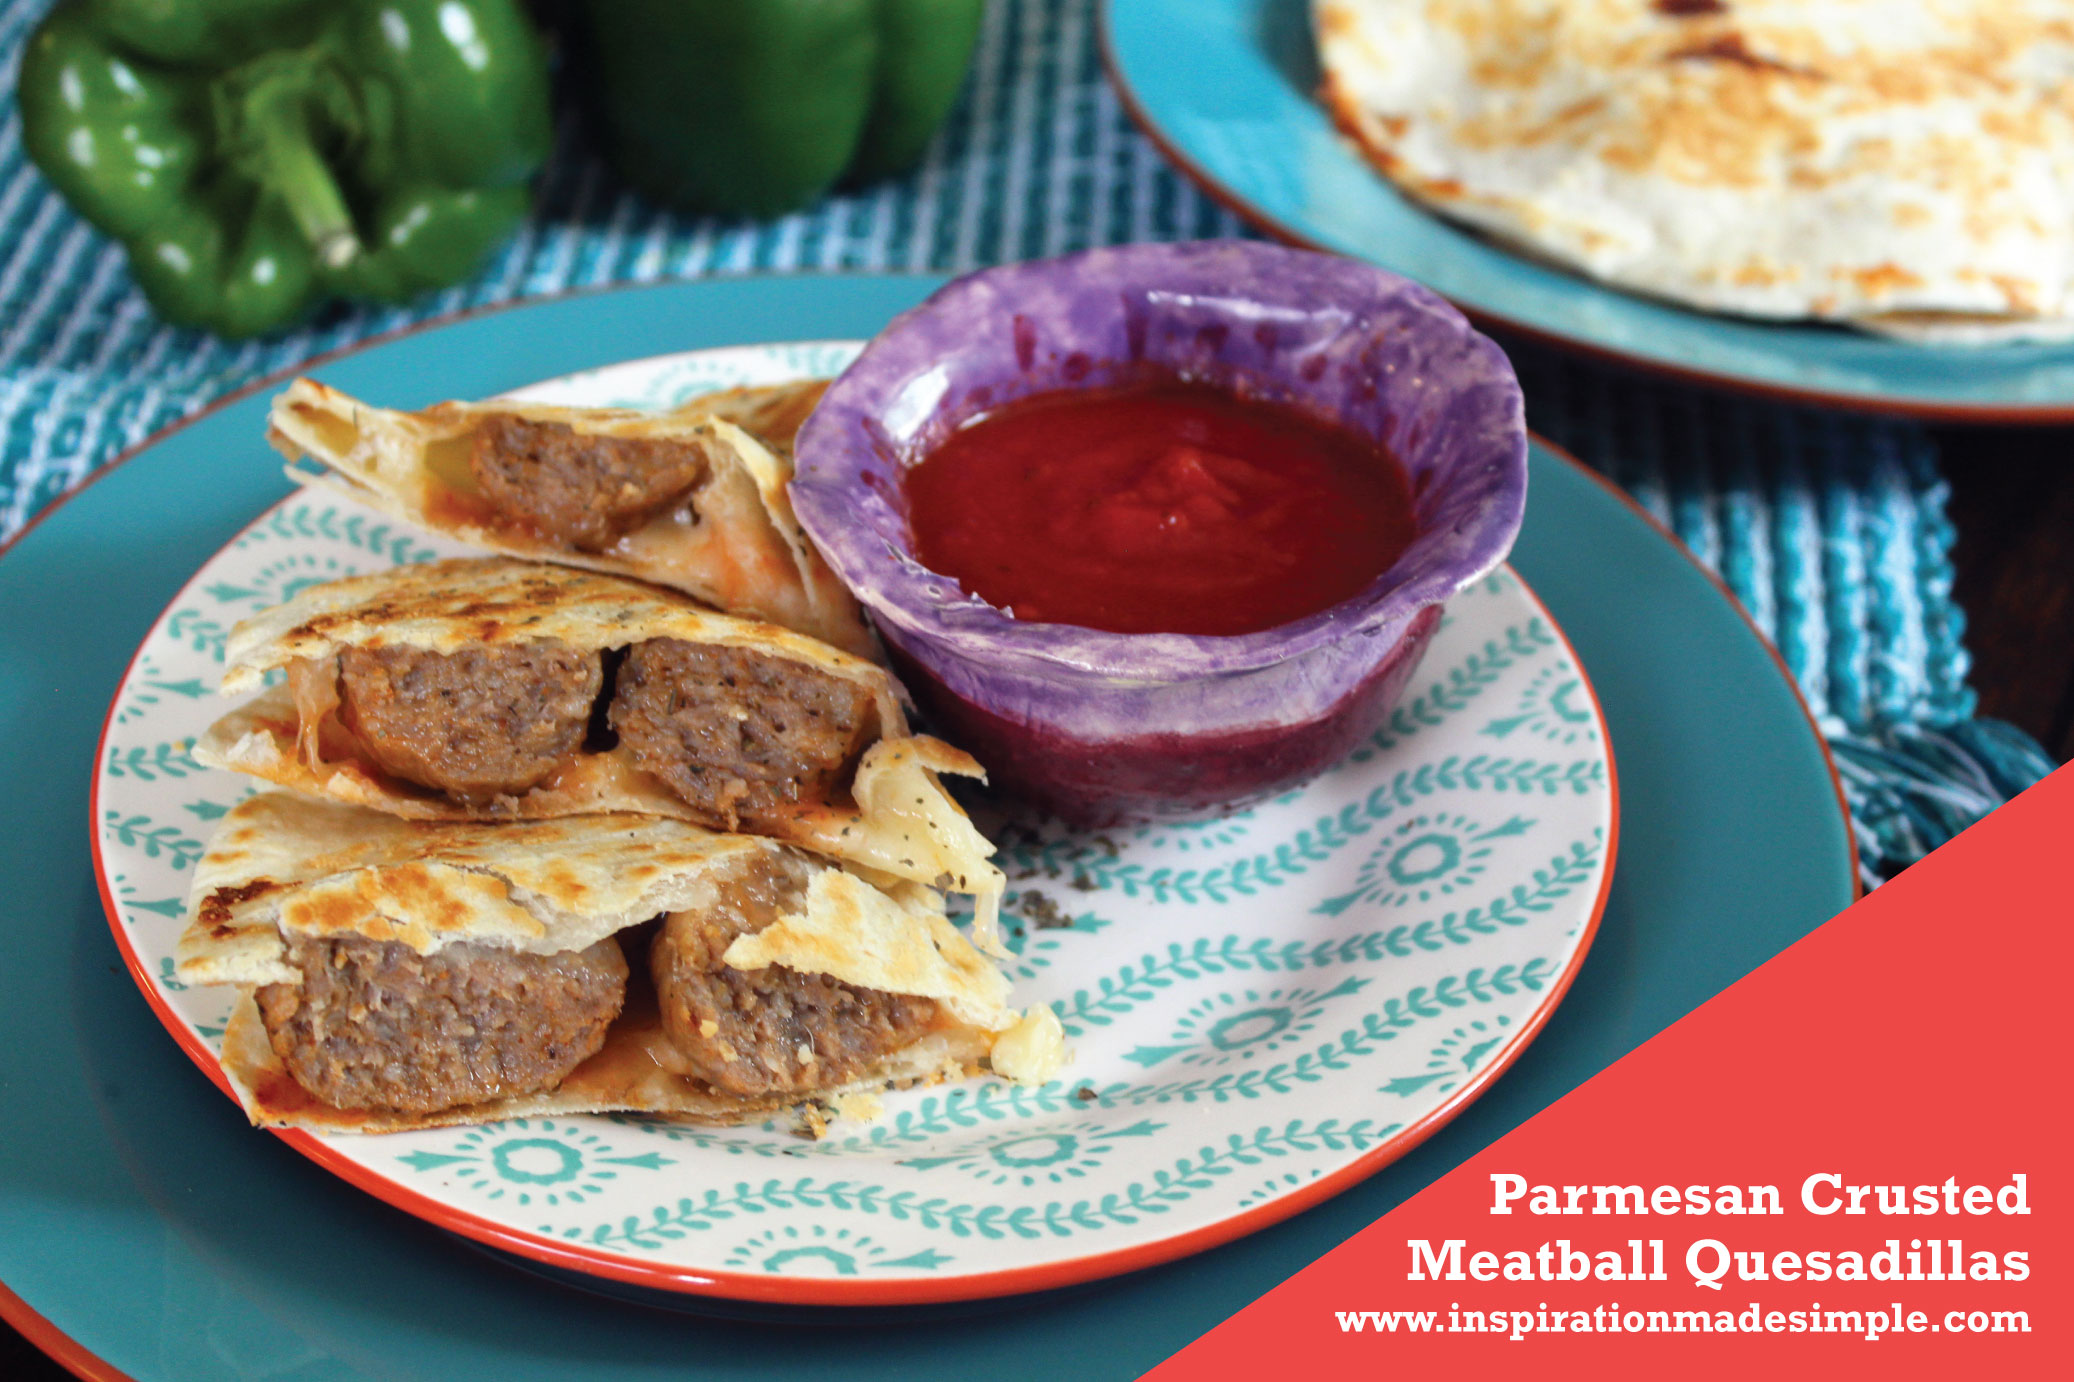 Parmesan Crusted Meatball Quesadillas